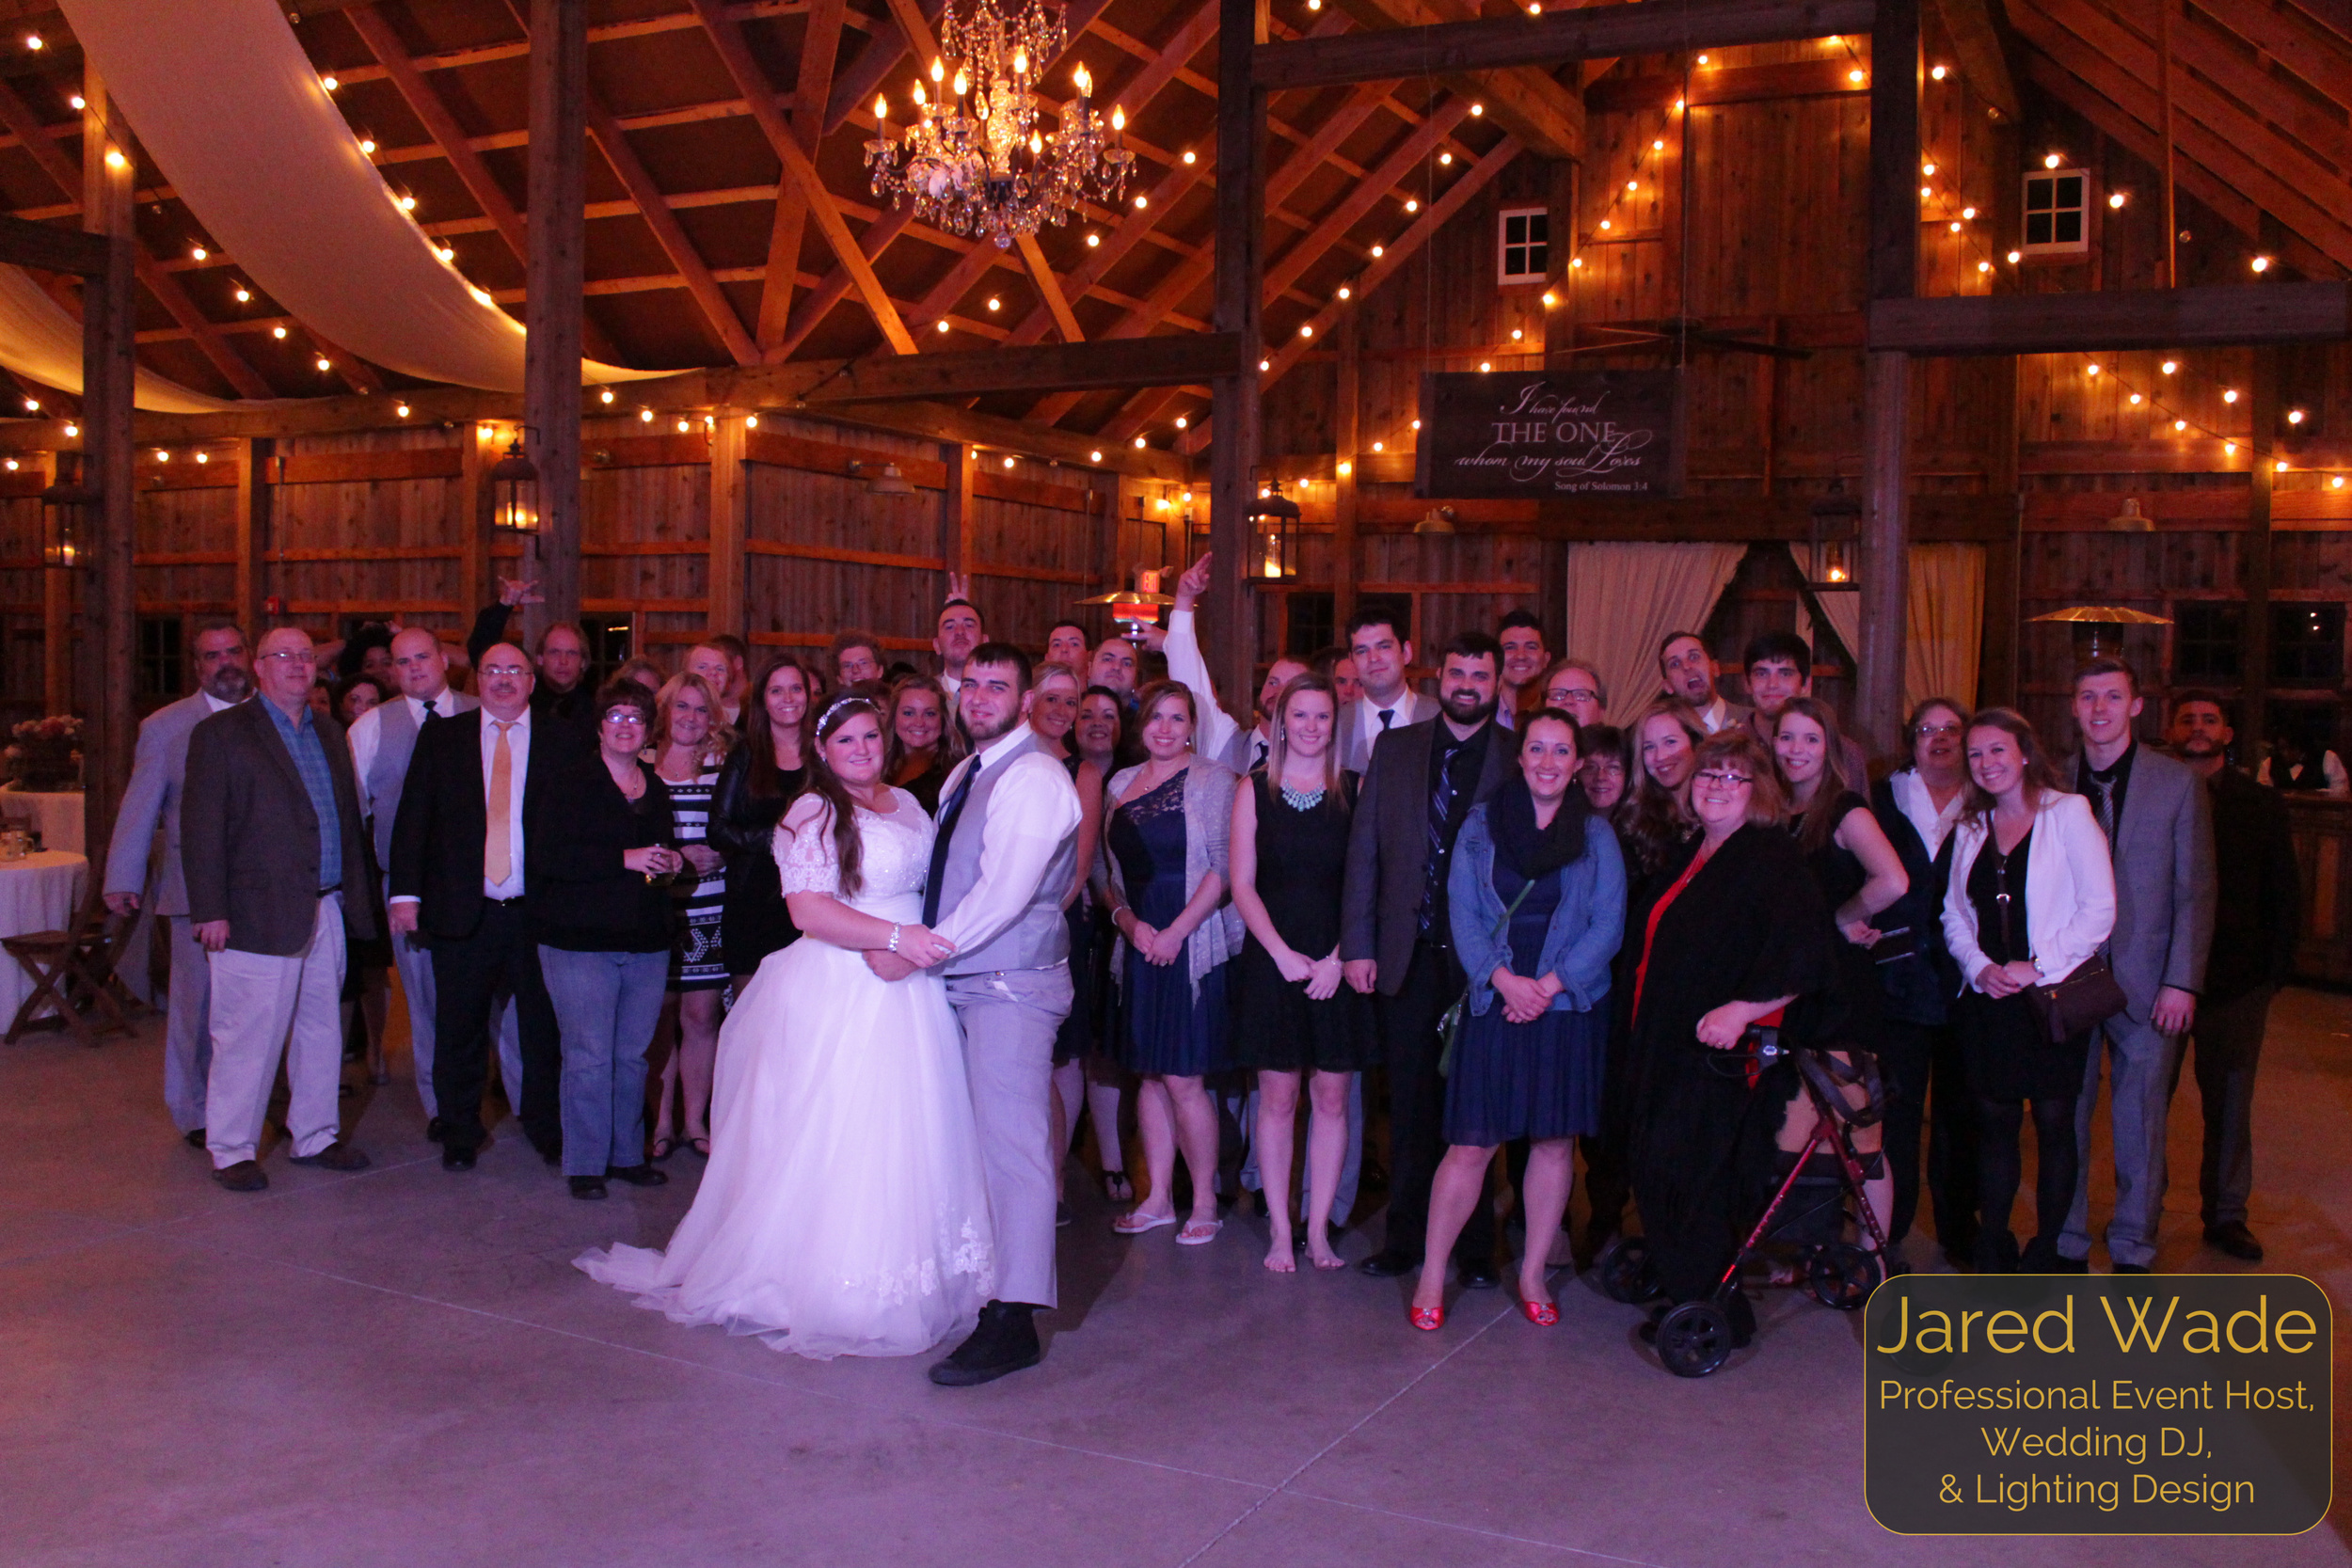 Kati & Cody Deckard Nice shot #ProfessionalEventHost #EndOfNightShot Indianapolis Wedding DJ and Professional Event Host Jared Wade